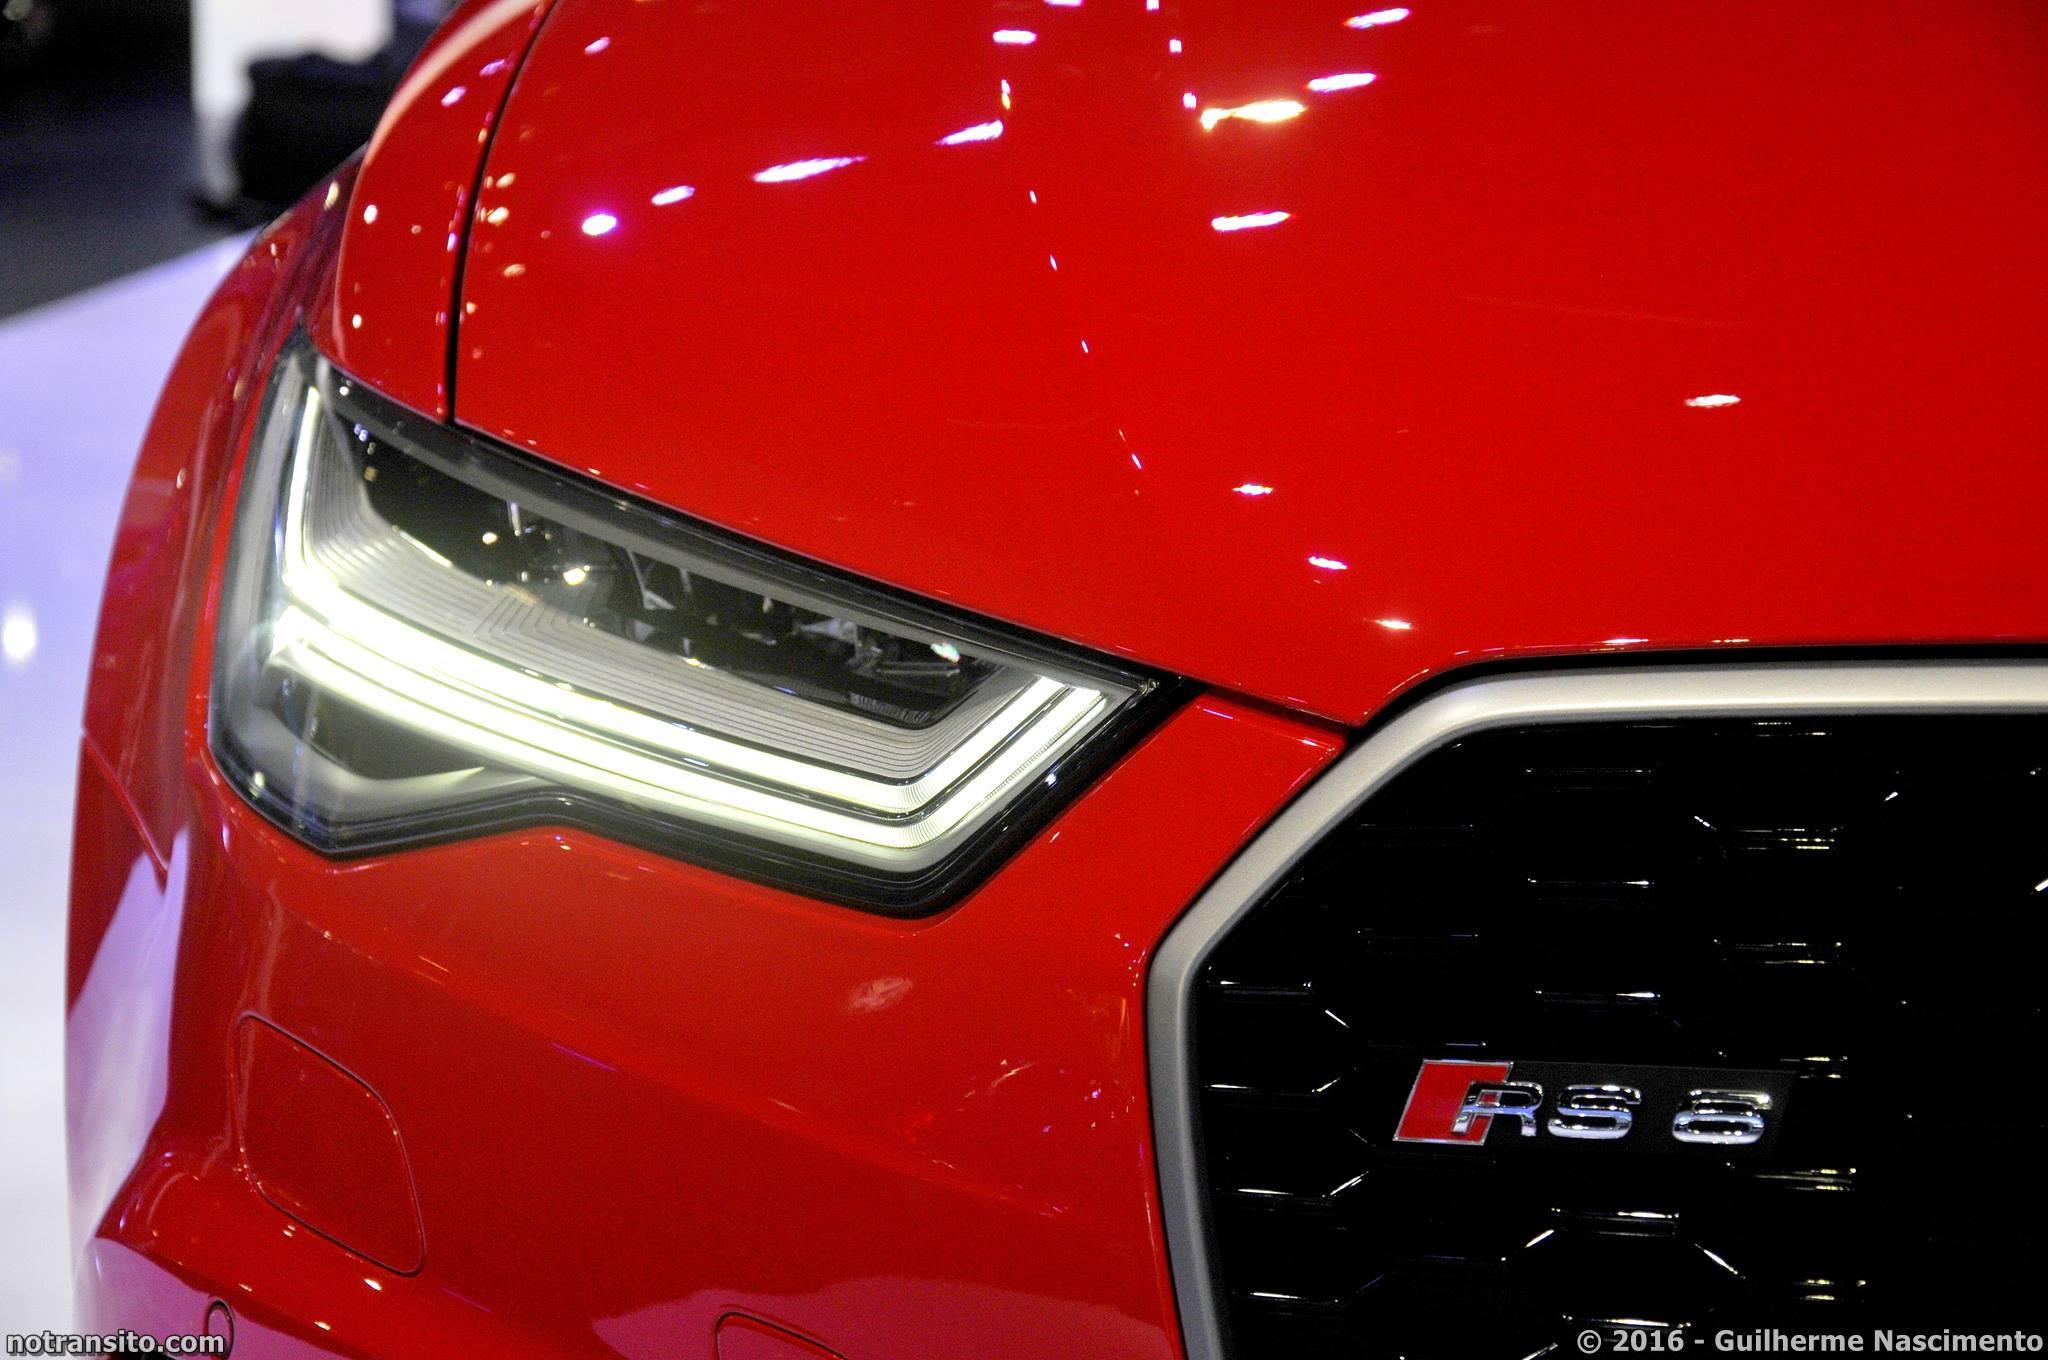 Audi RS6 Avant Performance, Salão do Automóvel 2016, 29º Salão do Automóvel de São Paulo